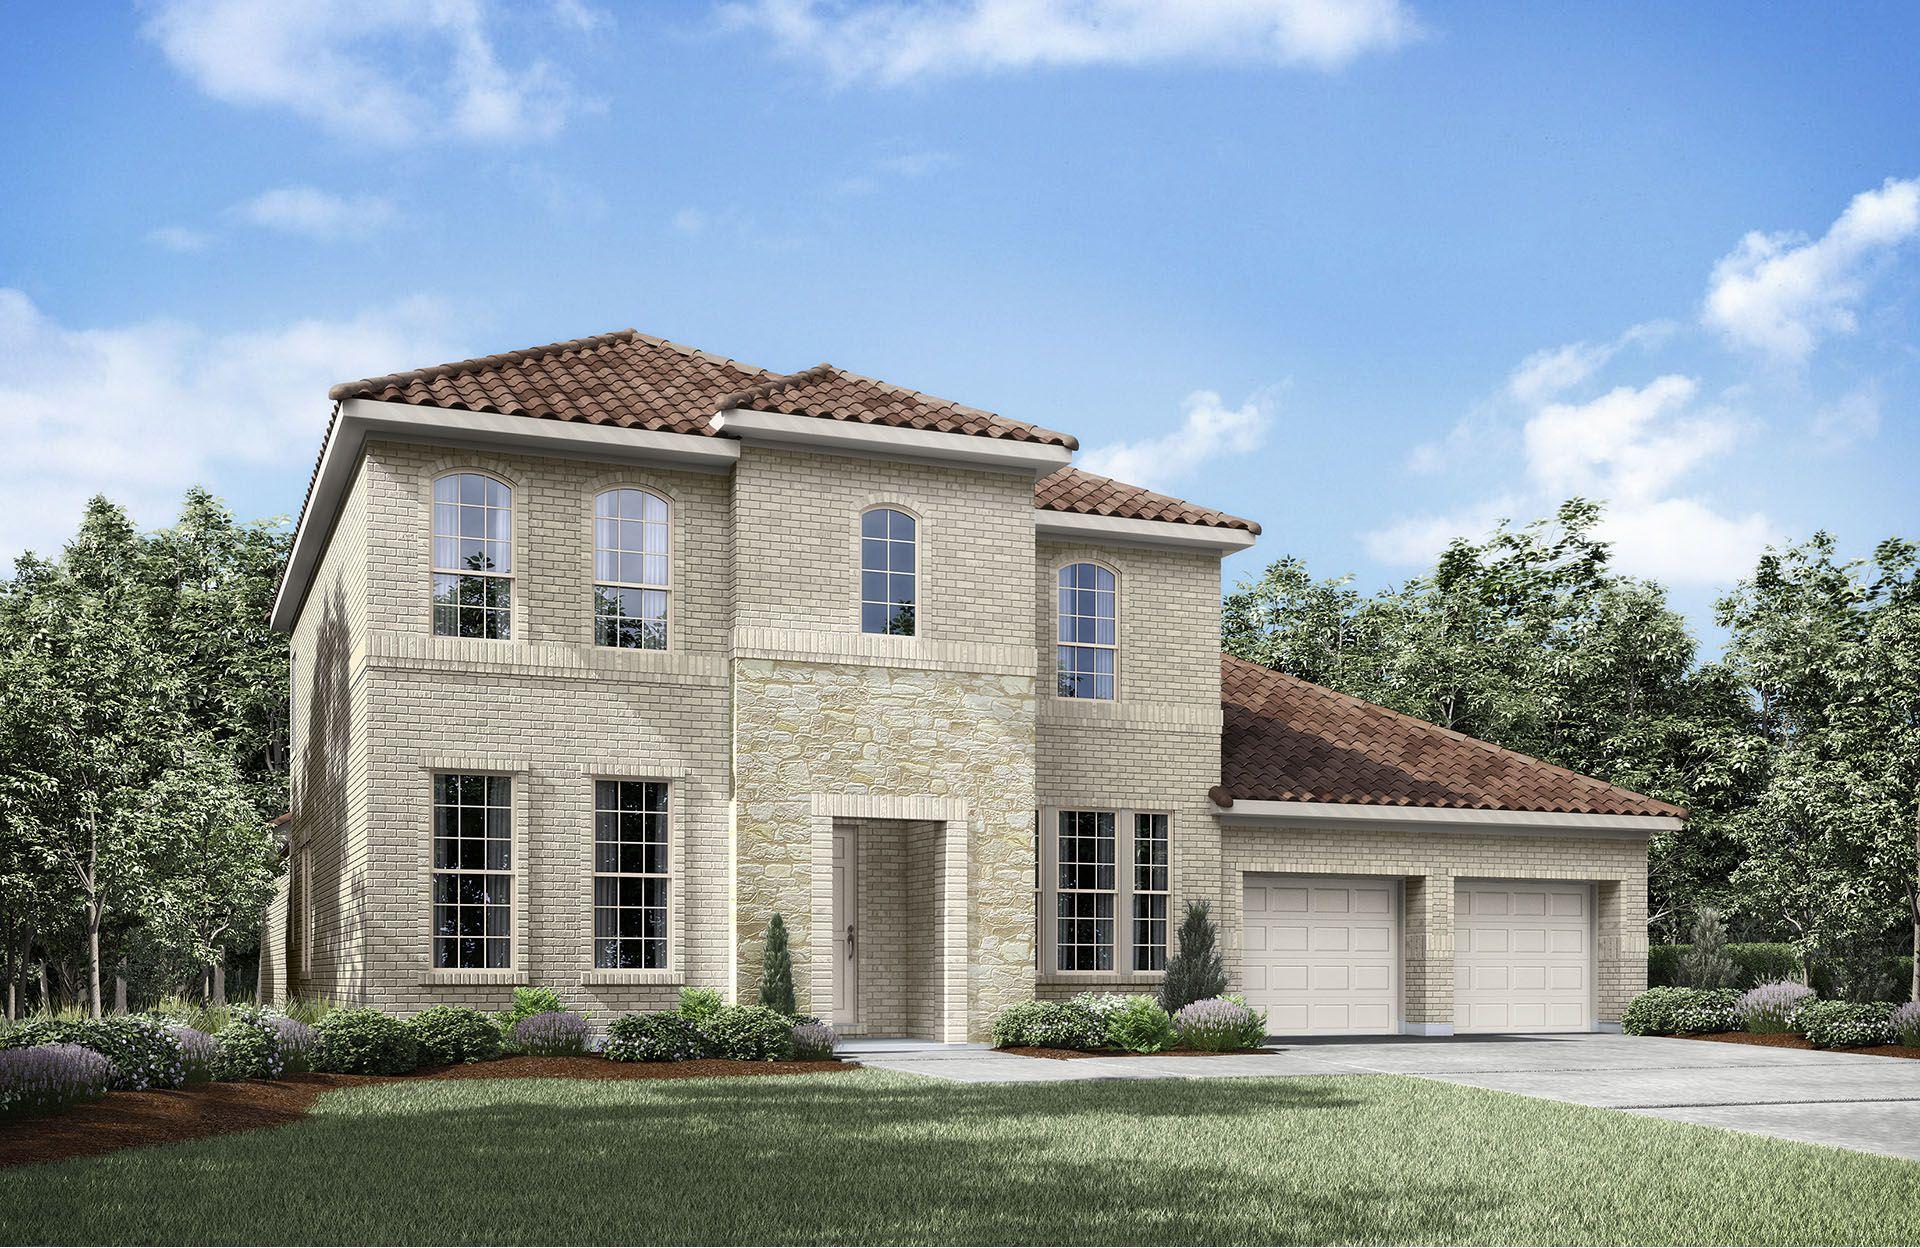 Single Family for Sale at Nine Oaks - Tanner 611 Oak Grove Lane Coppell, Texas 75019 United States